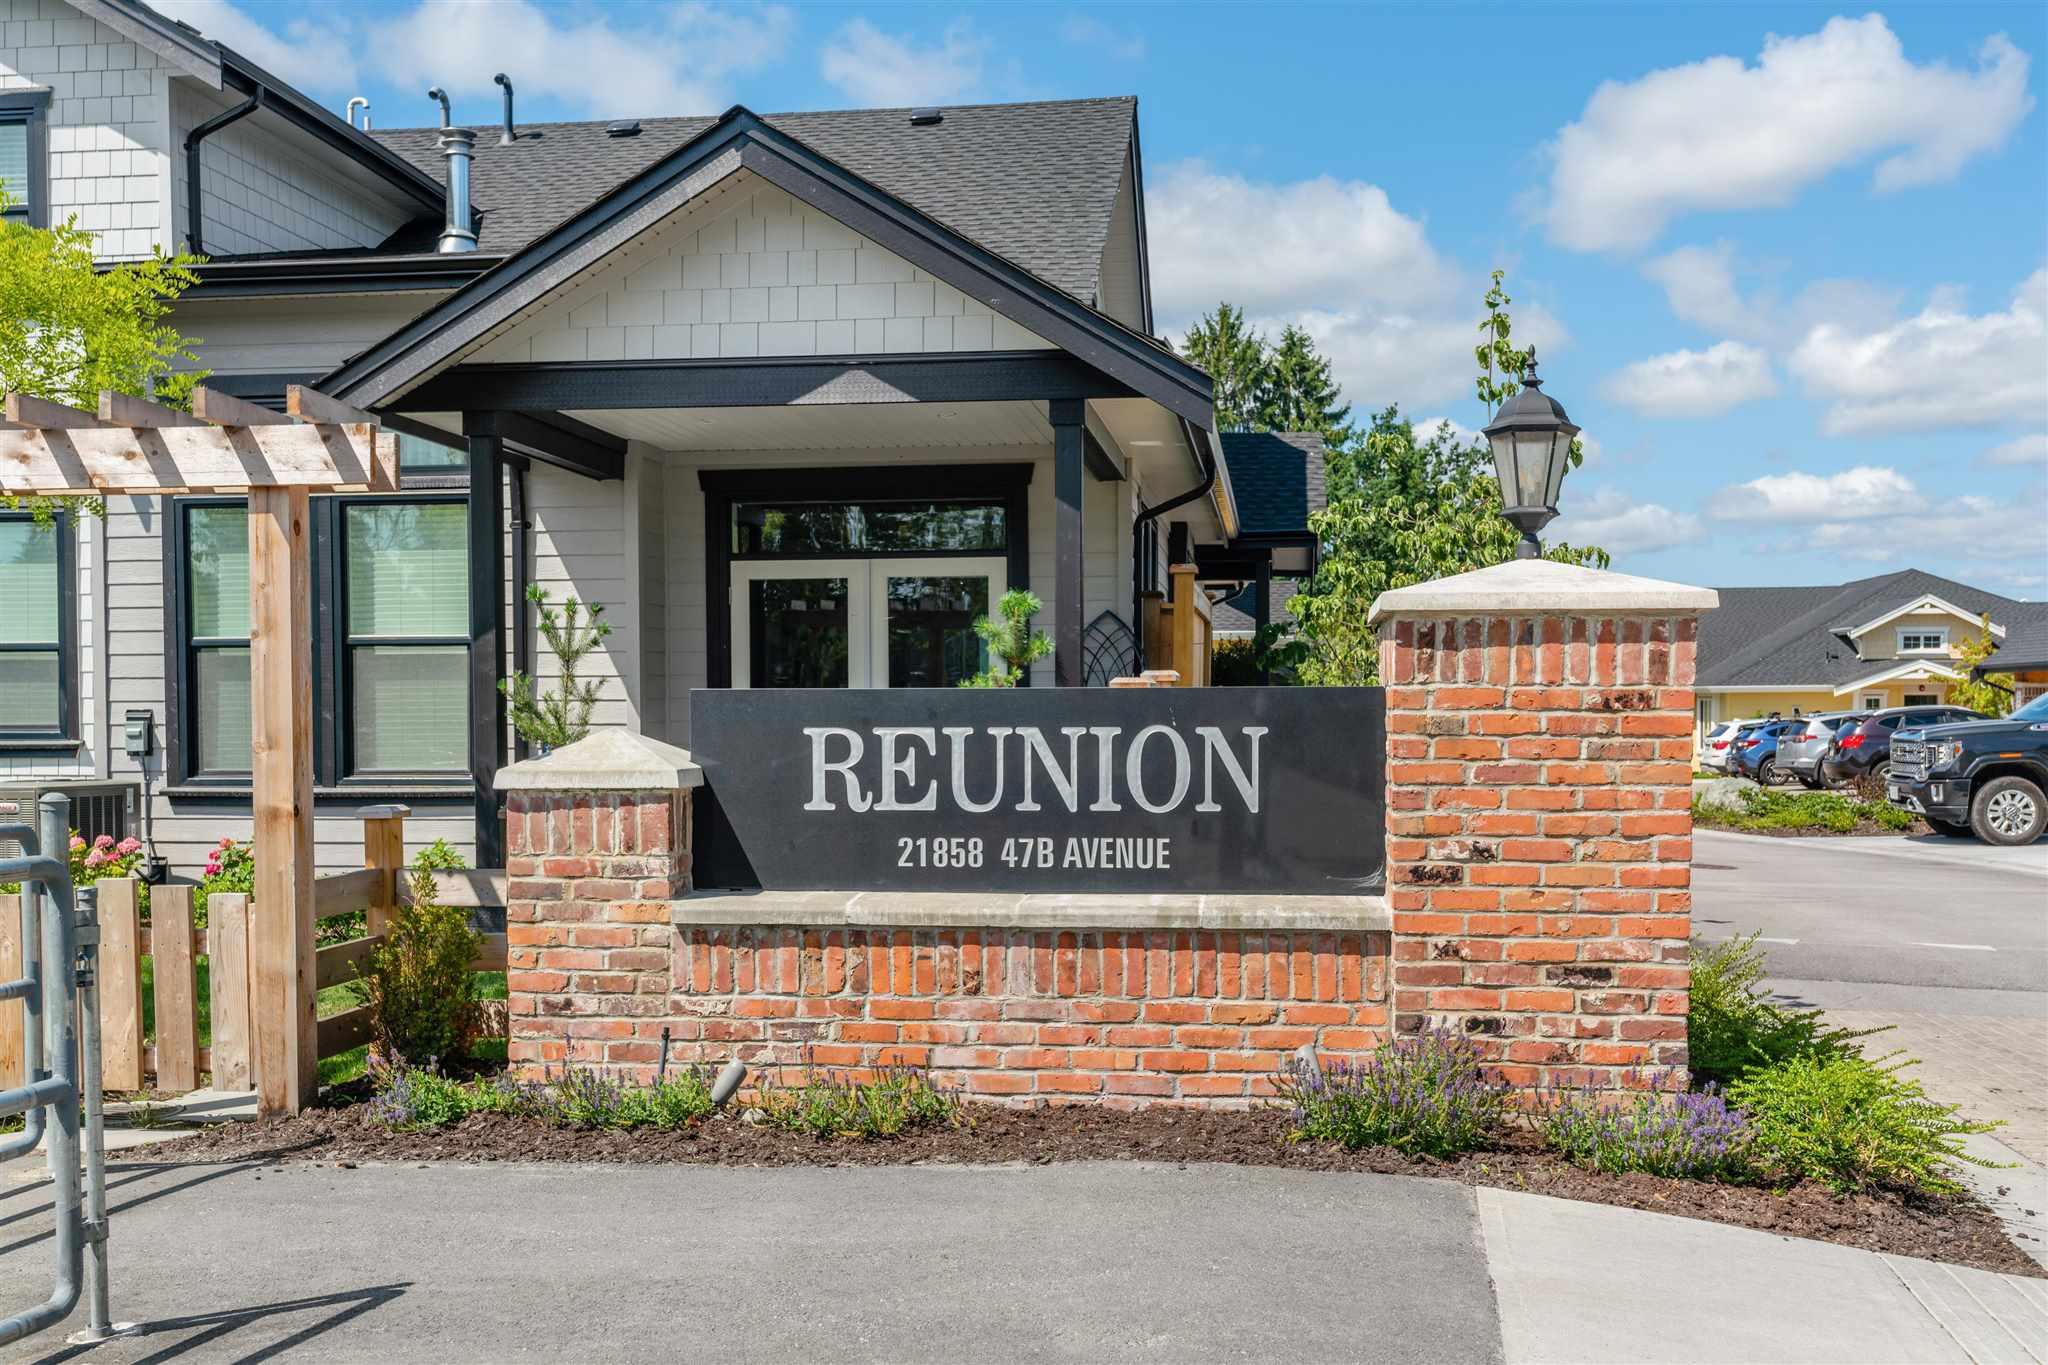 40 21858 47B AVENUE - Murrayville Townhouse for sale, 4 Bedrooms (R2603956) - #40